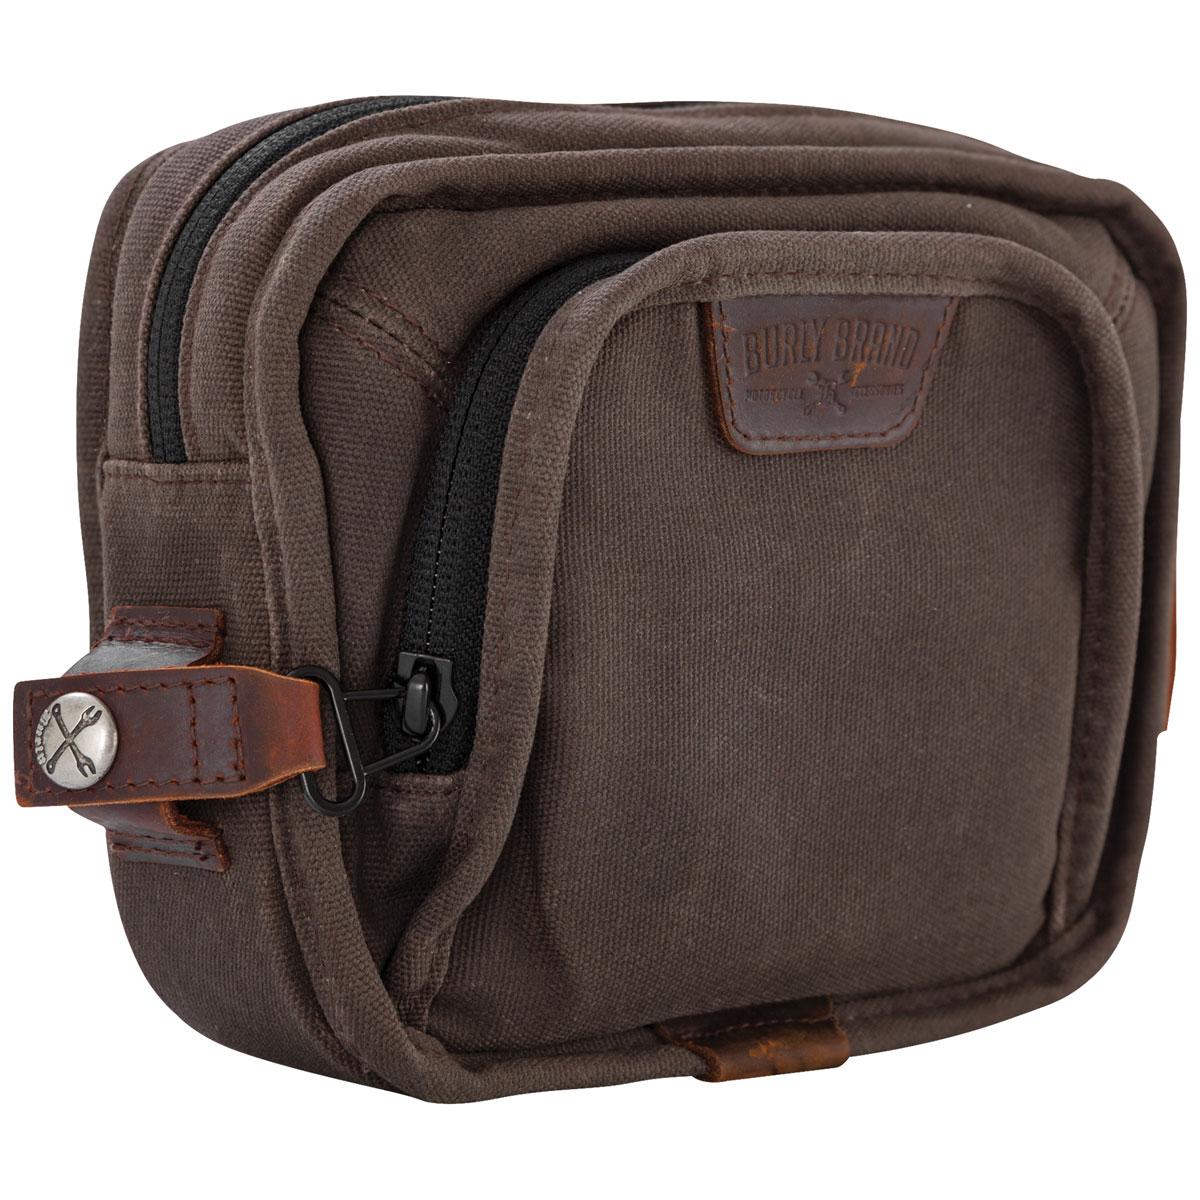 Burly Brand Voyager Dark Oak Handlebar Bag